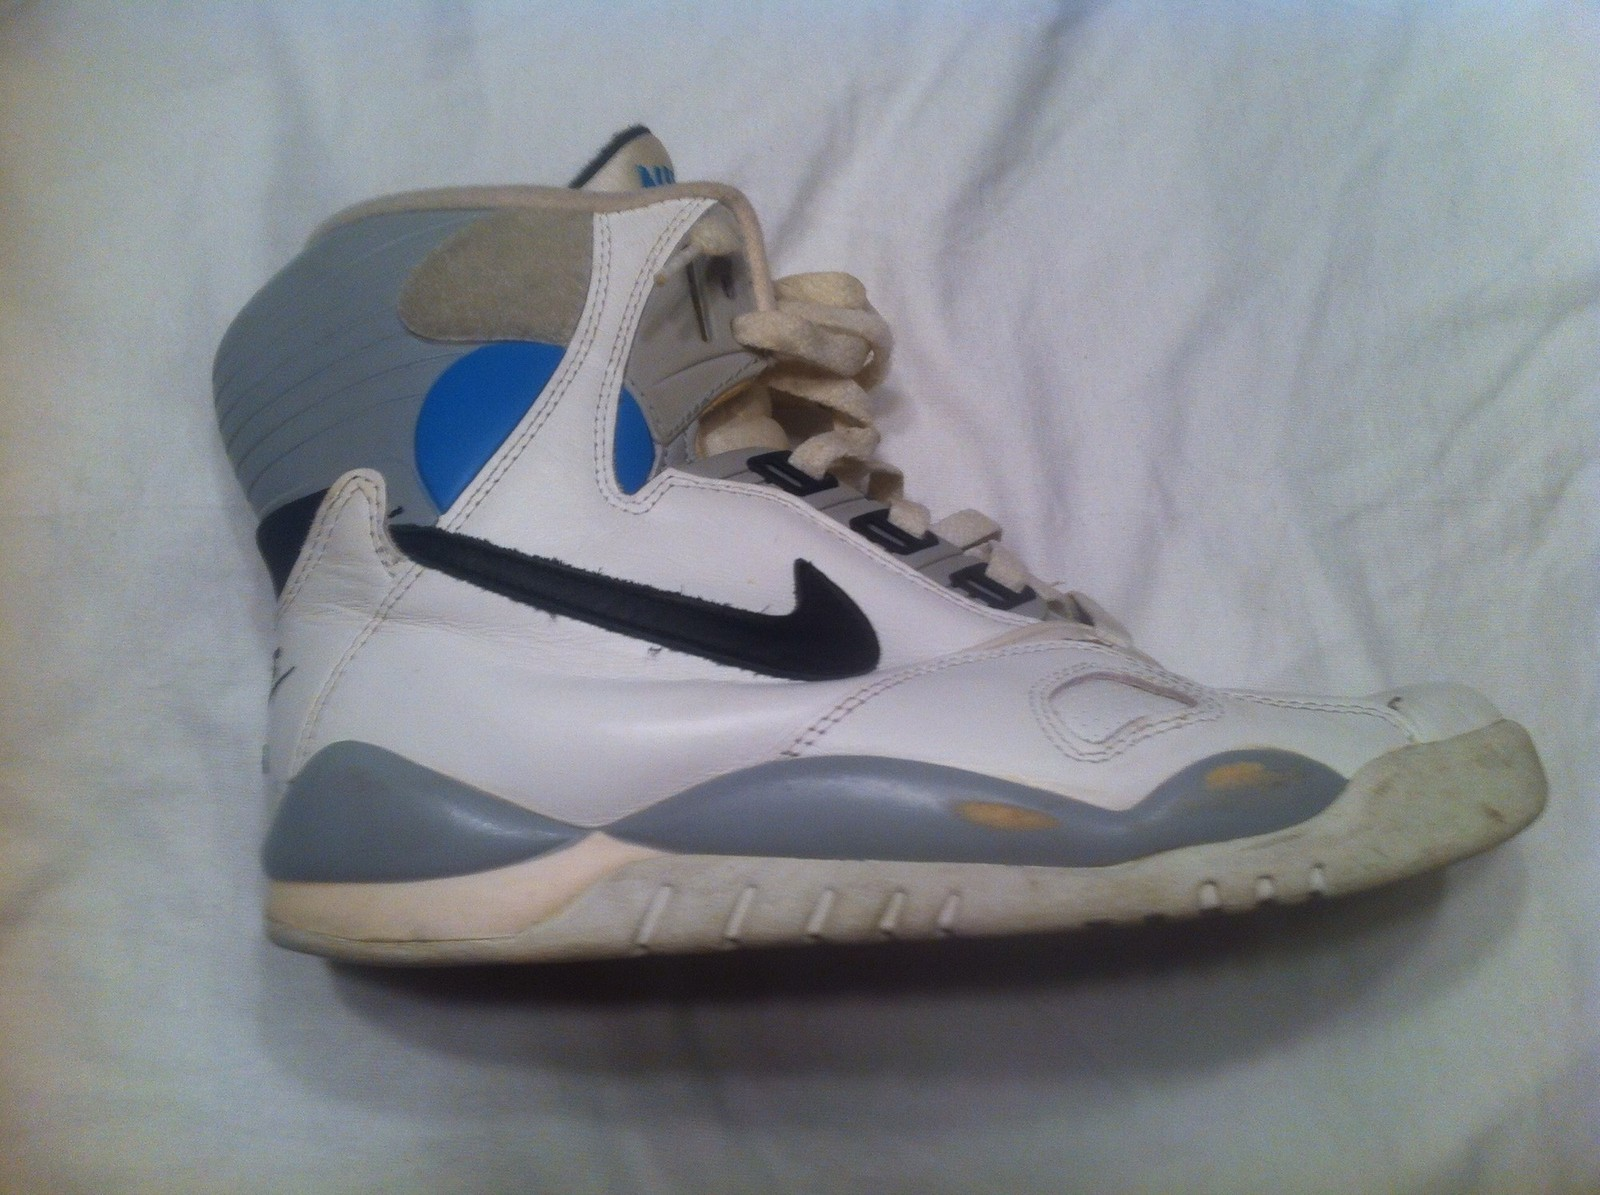 Nike Air Pressure Rare Sample White Grey Blue 1989 Defy